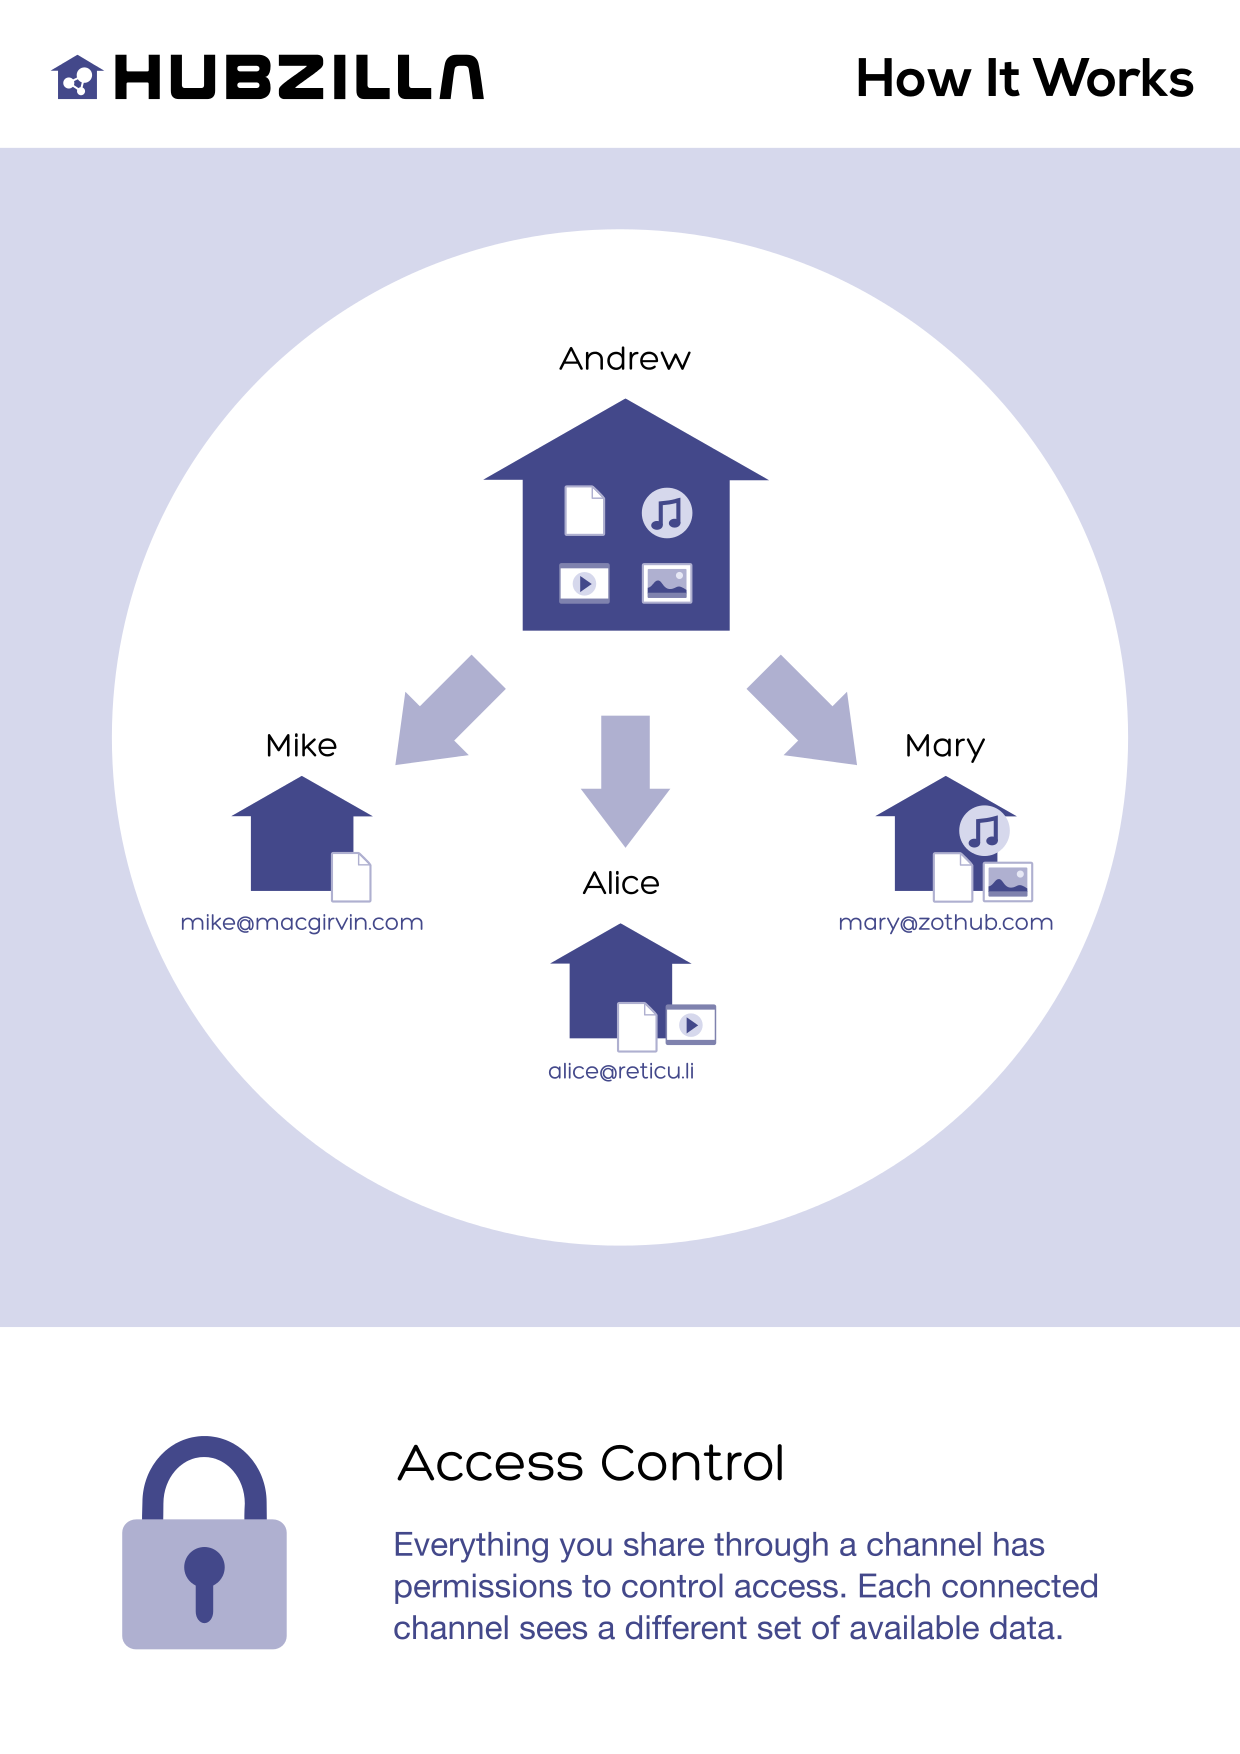 access_control.png